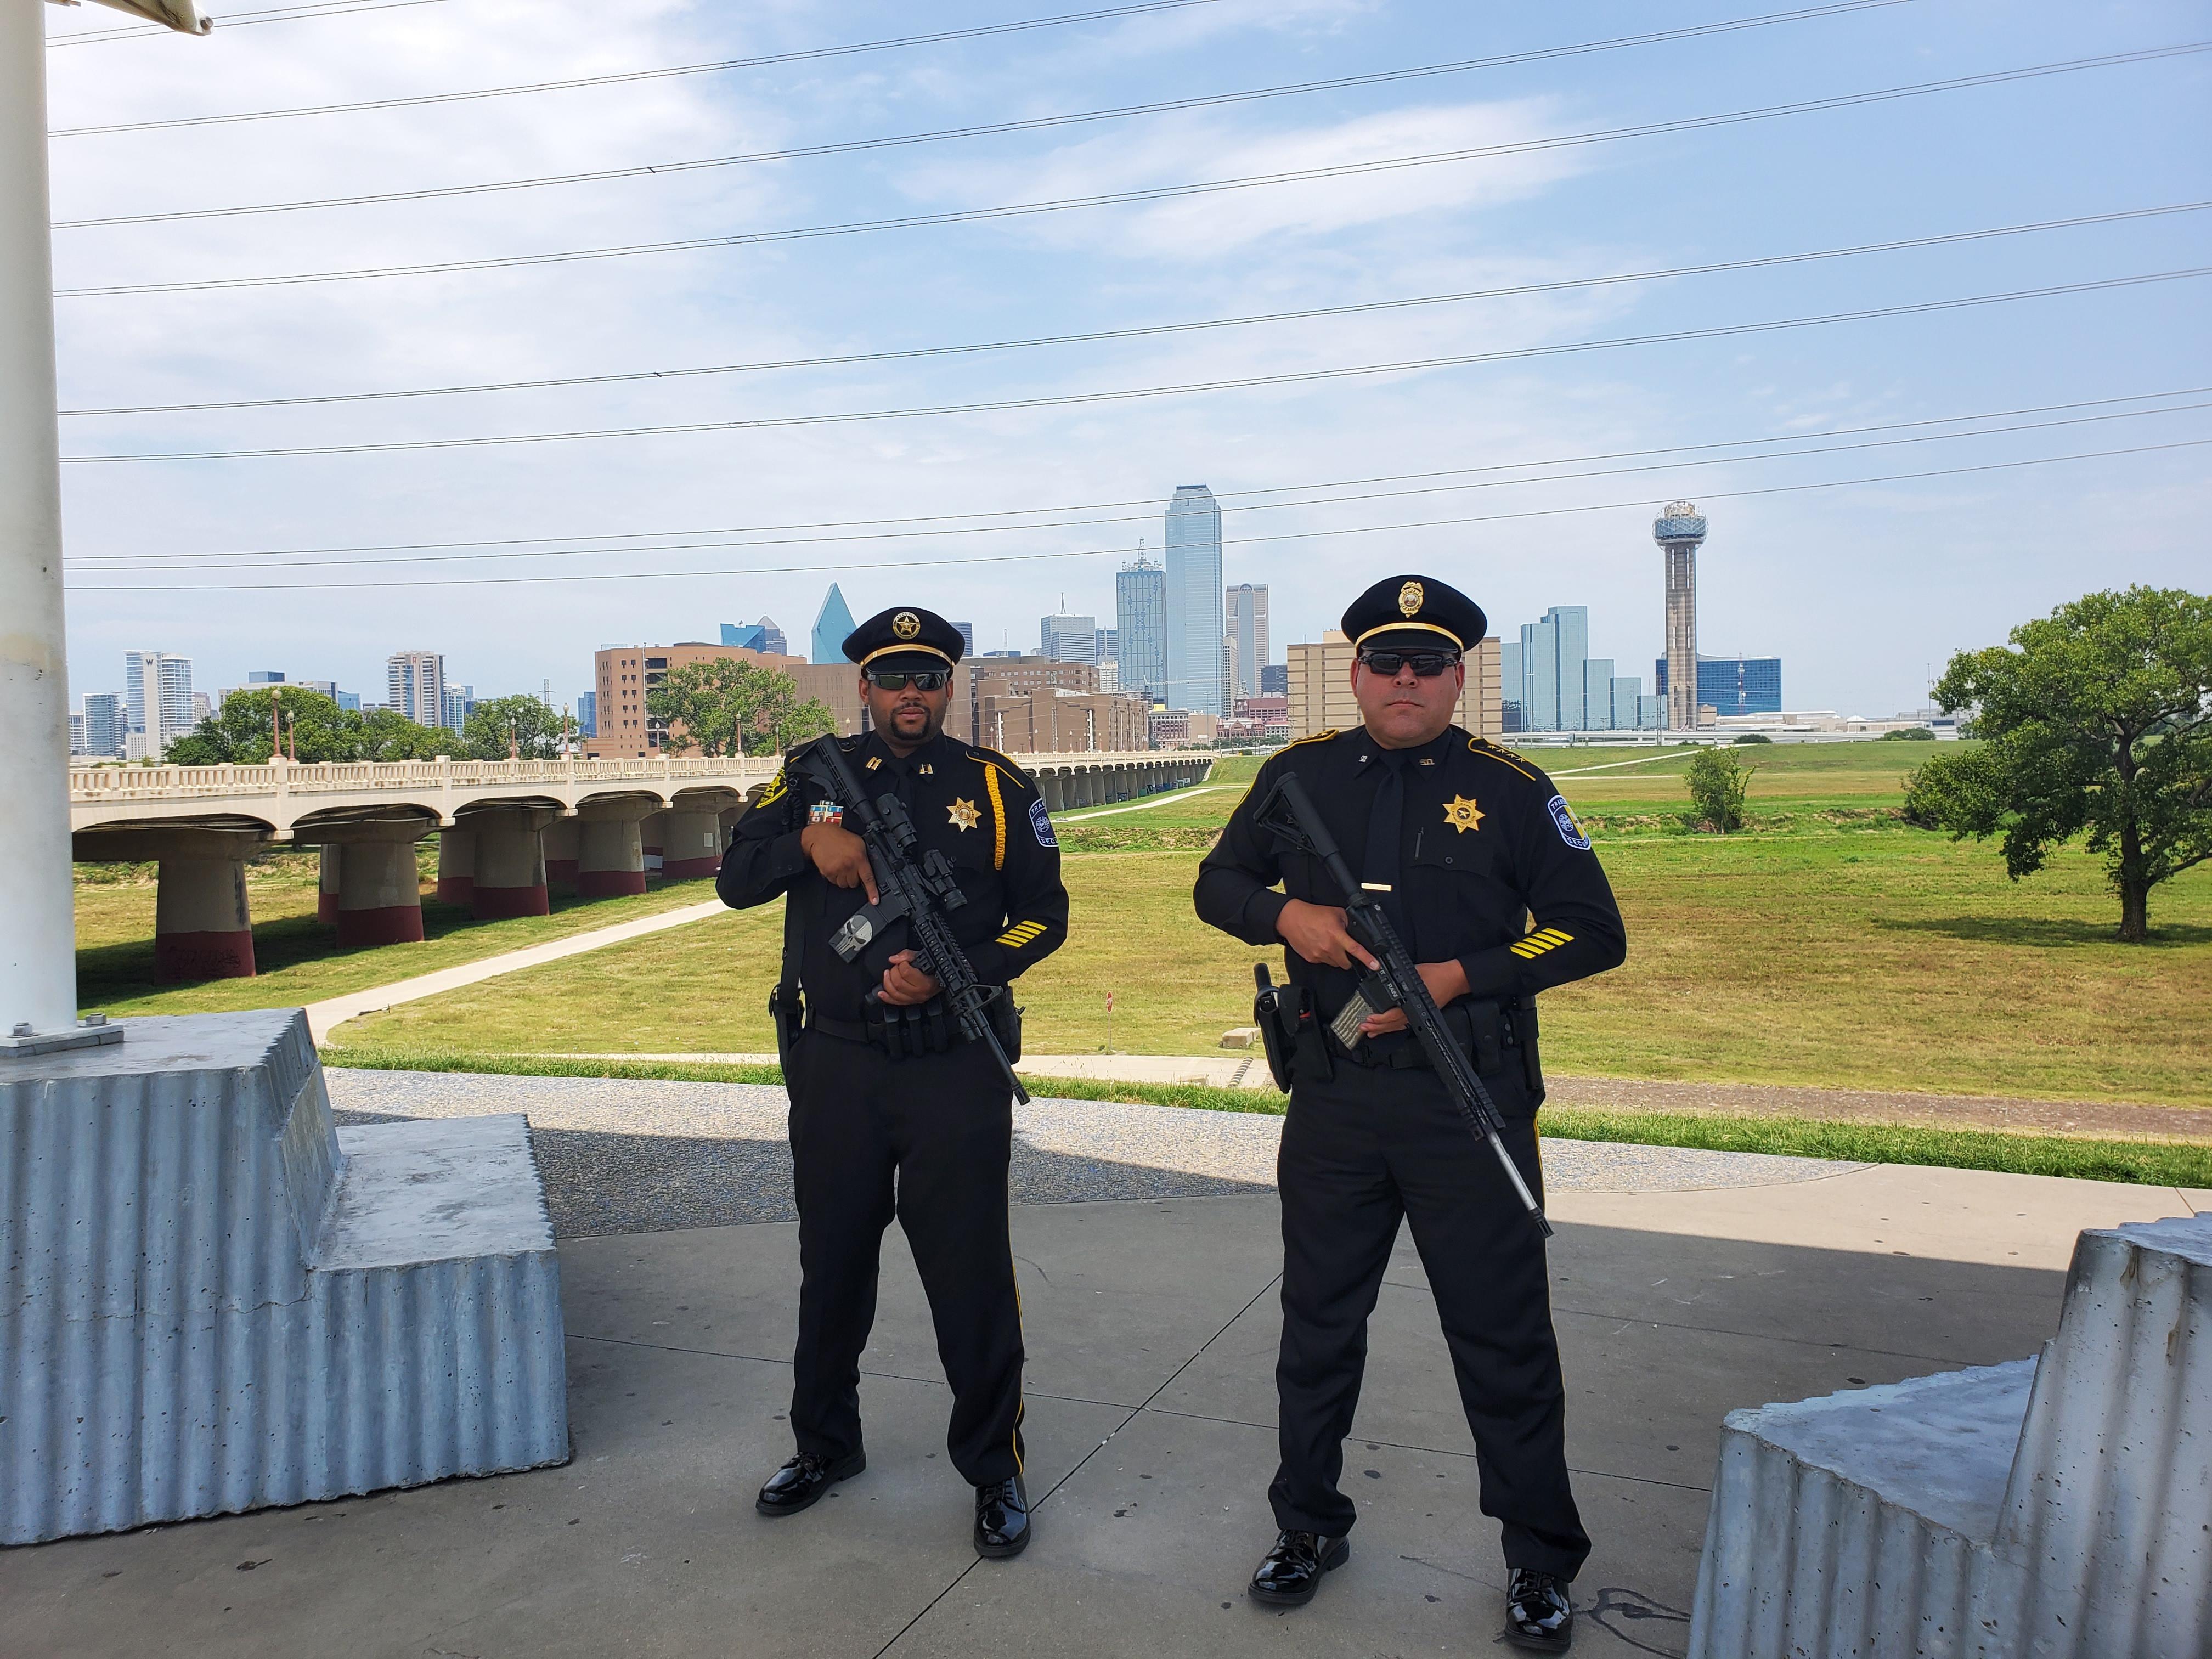 USA Patrol Division